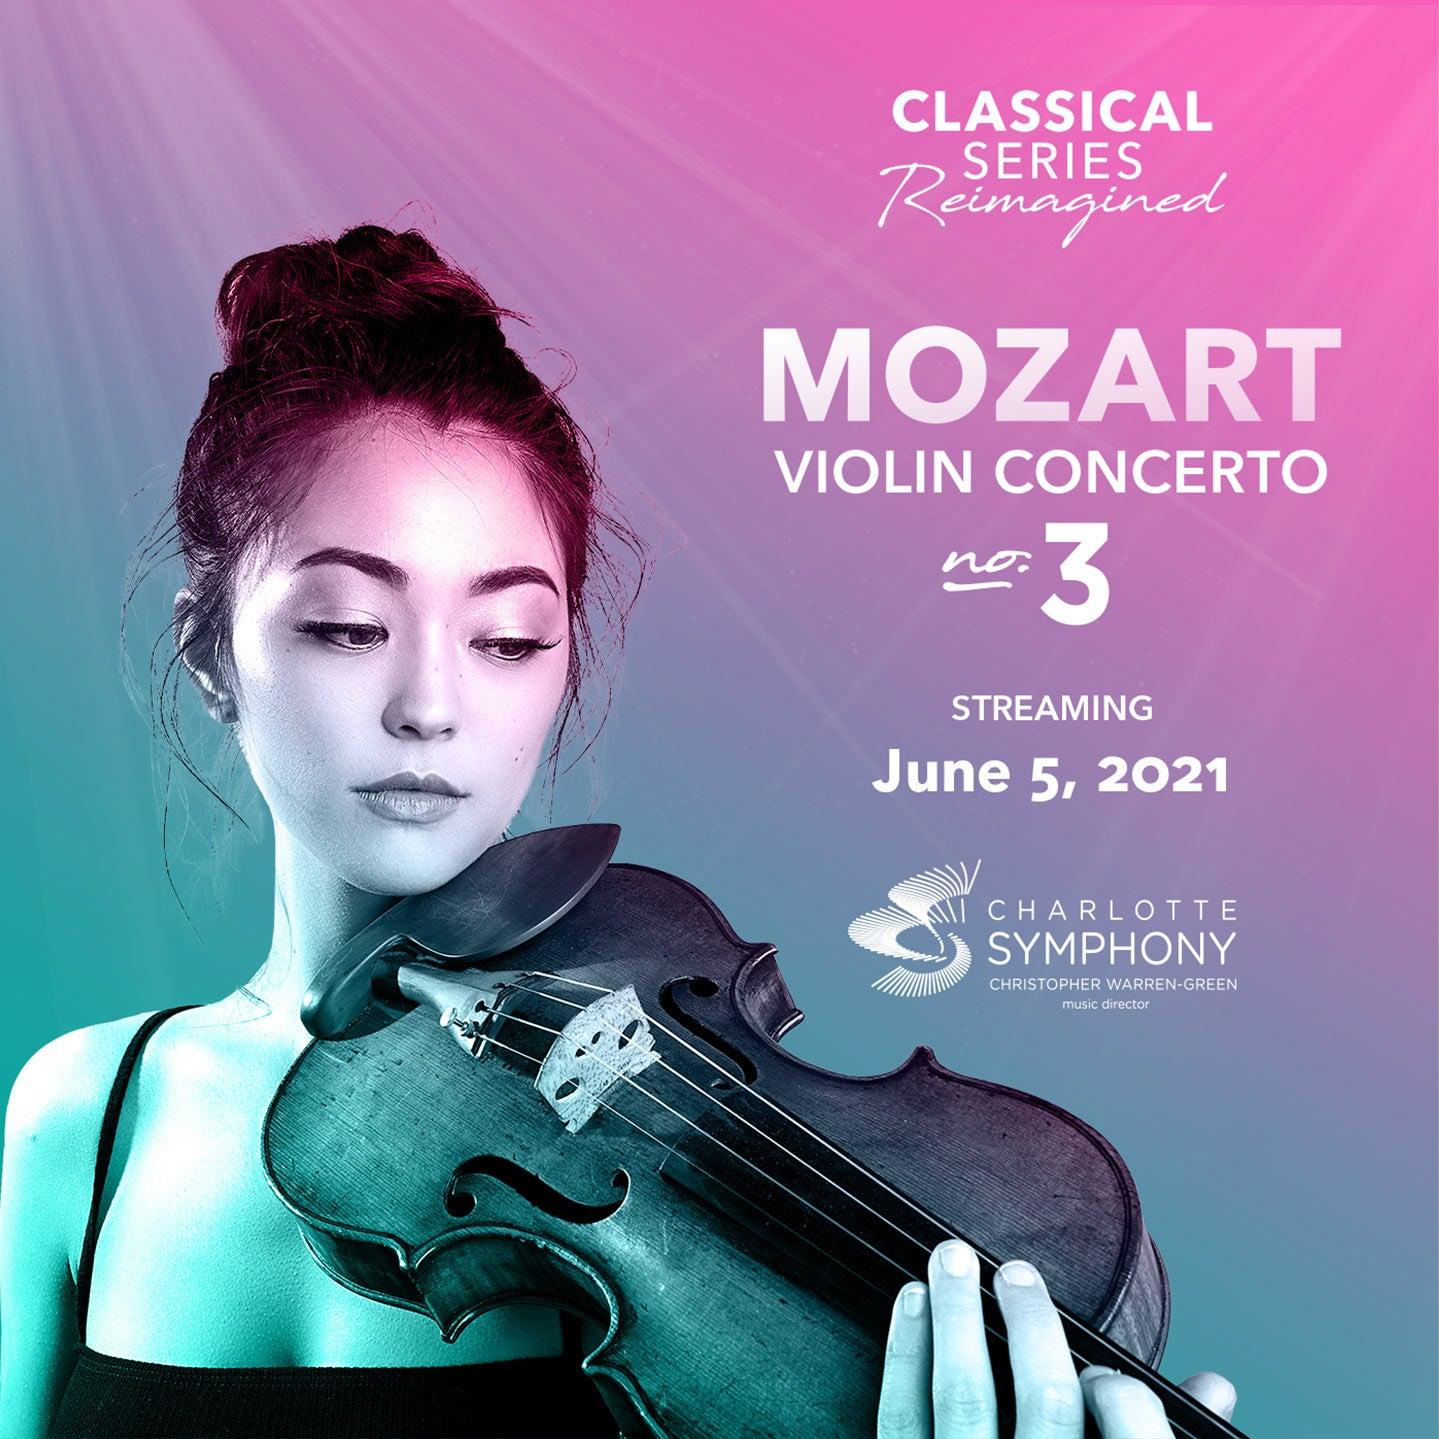 Charlotte Symphony: Mozart Violin Concerto No 3